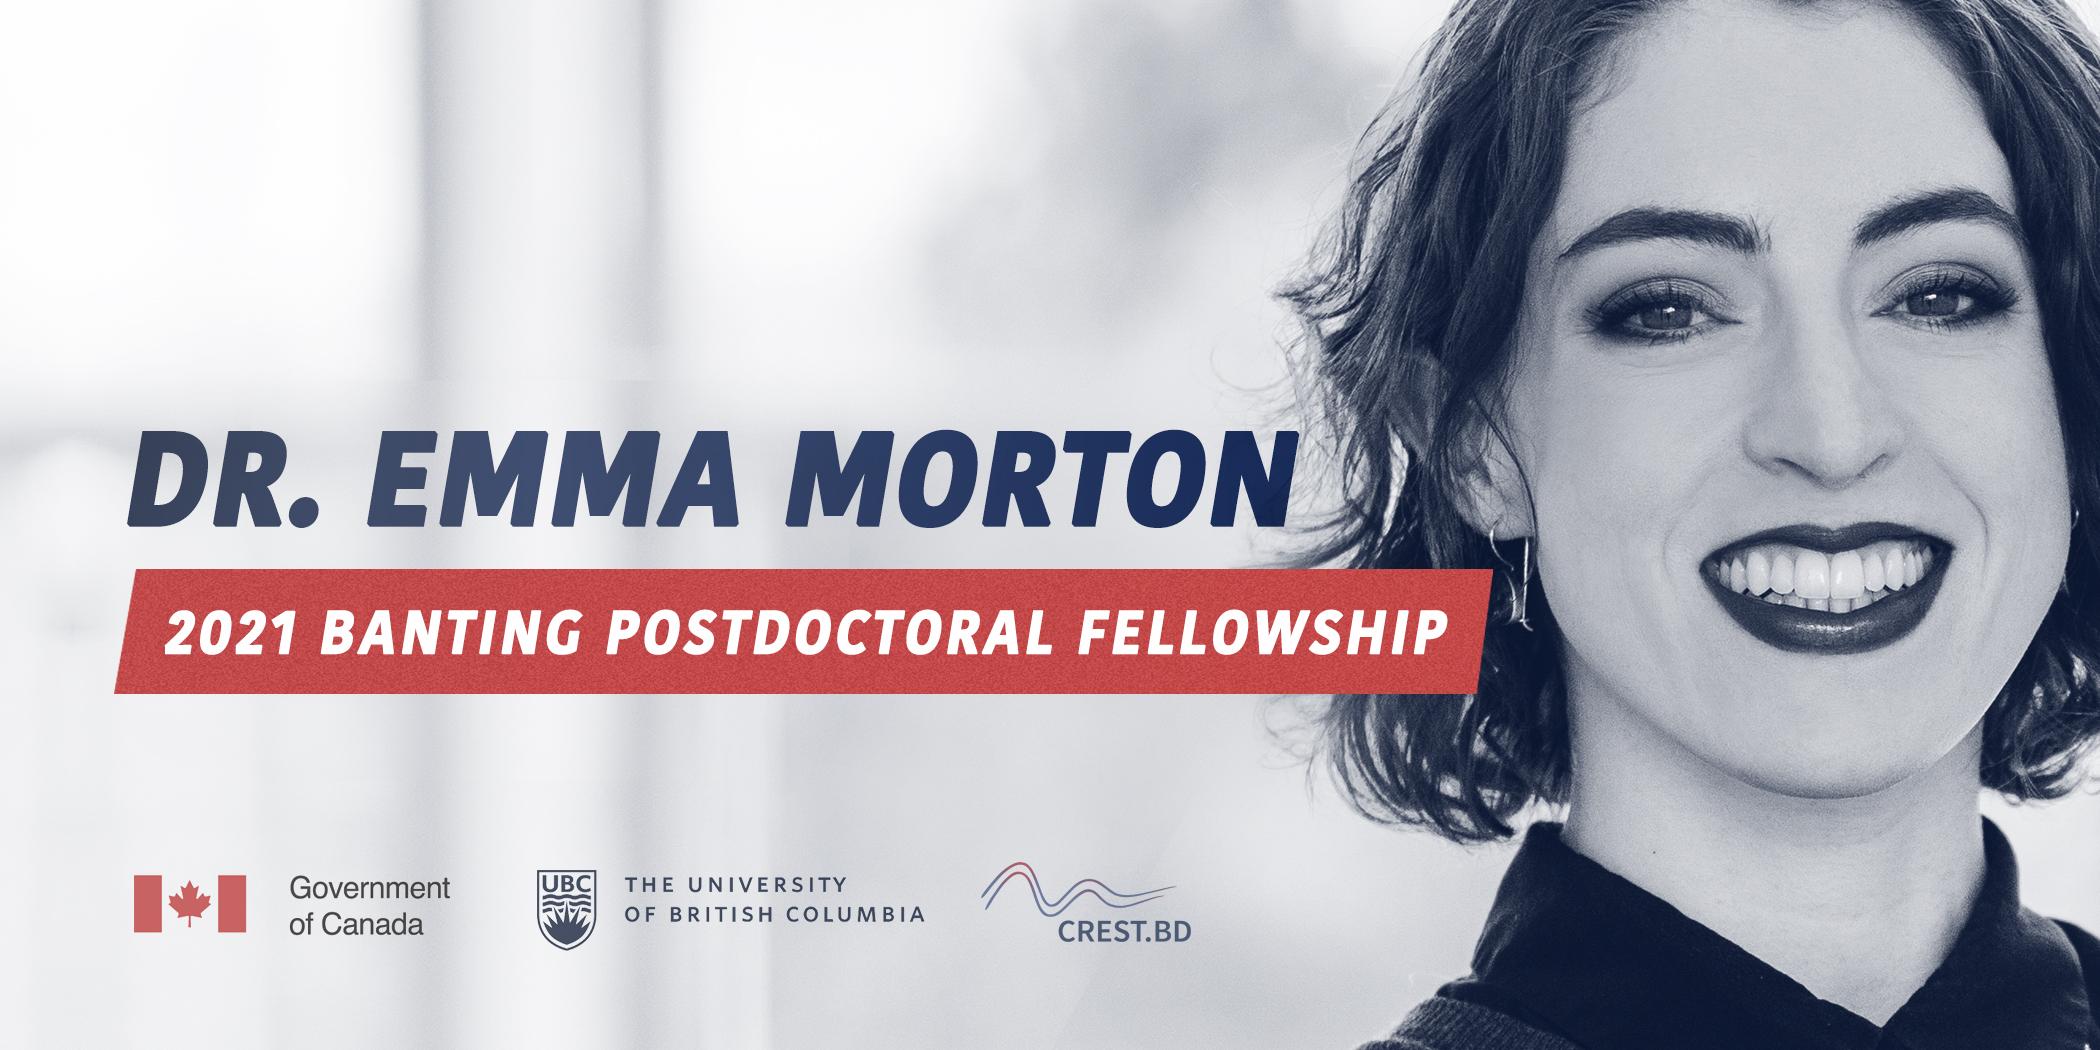 Congratulations to Dr. Emma Morton on receiving the Banting Fellowship!